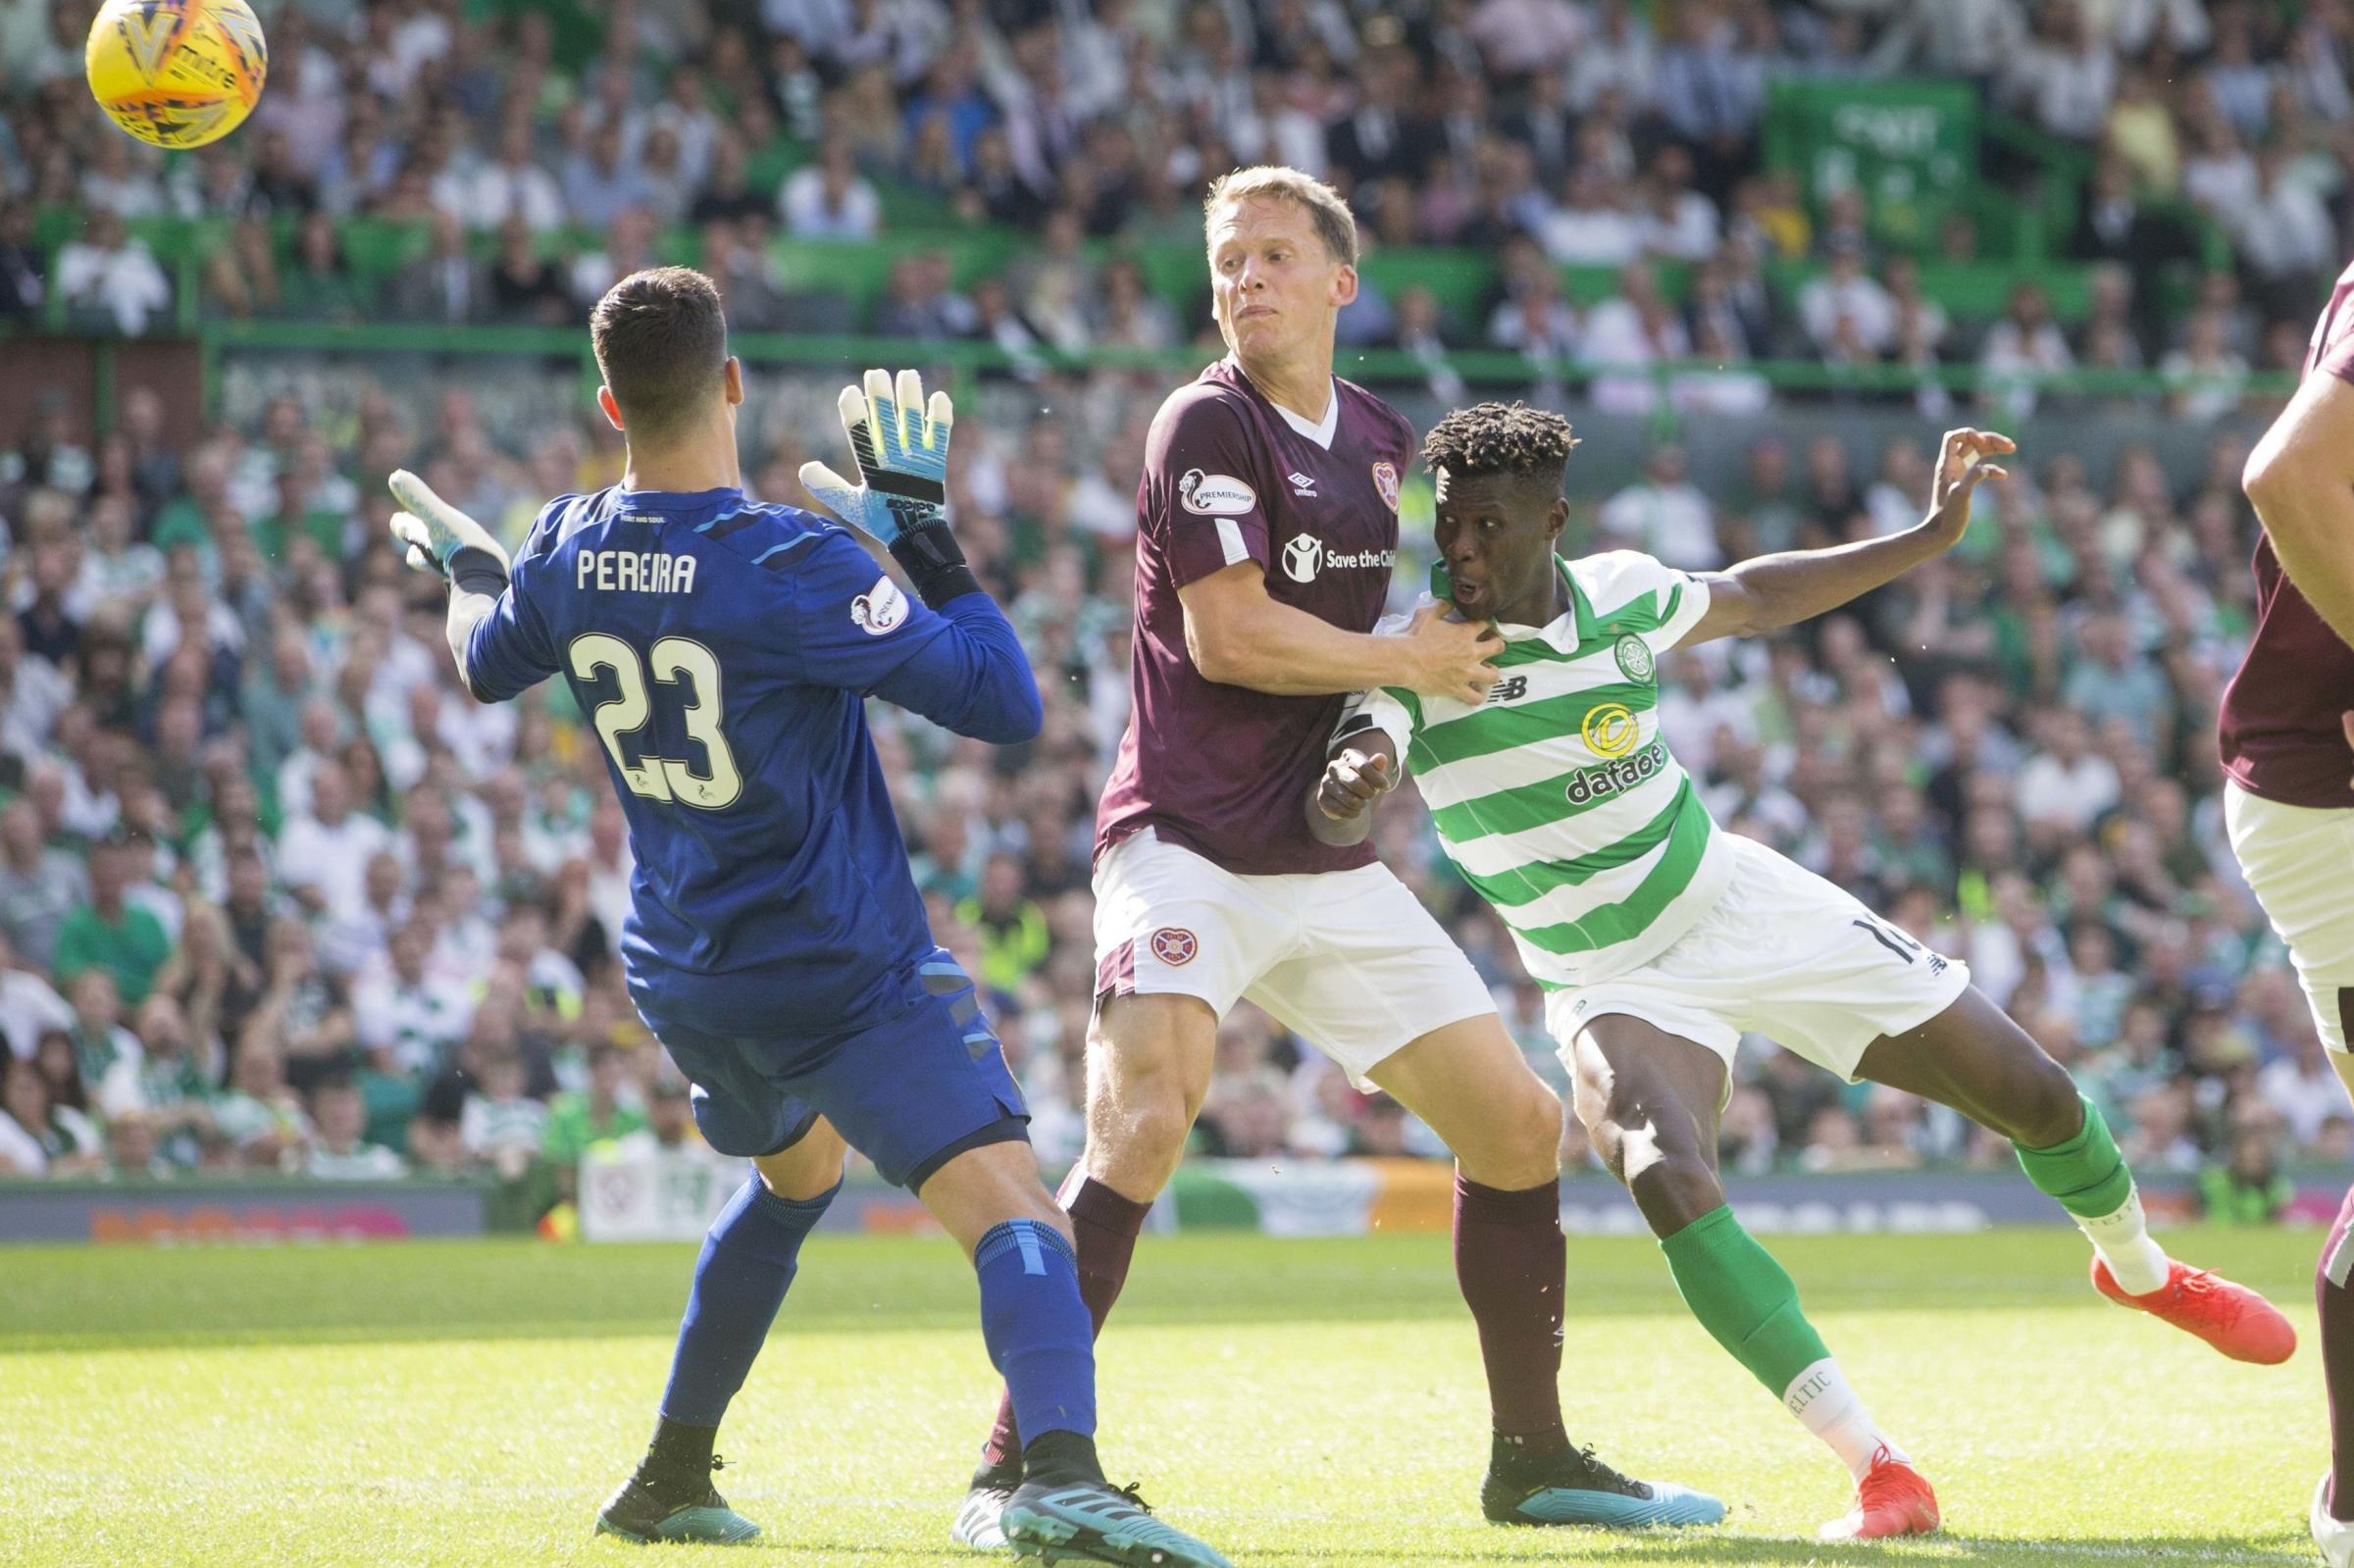 Celtic 3 Hearts 1: Bayo at the double as Neil Lennon's men reclaim top spot